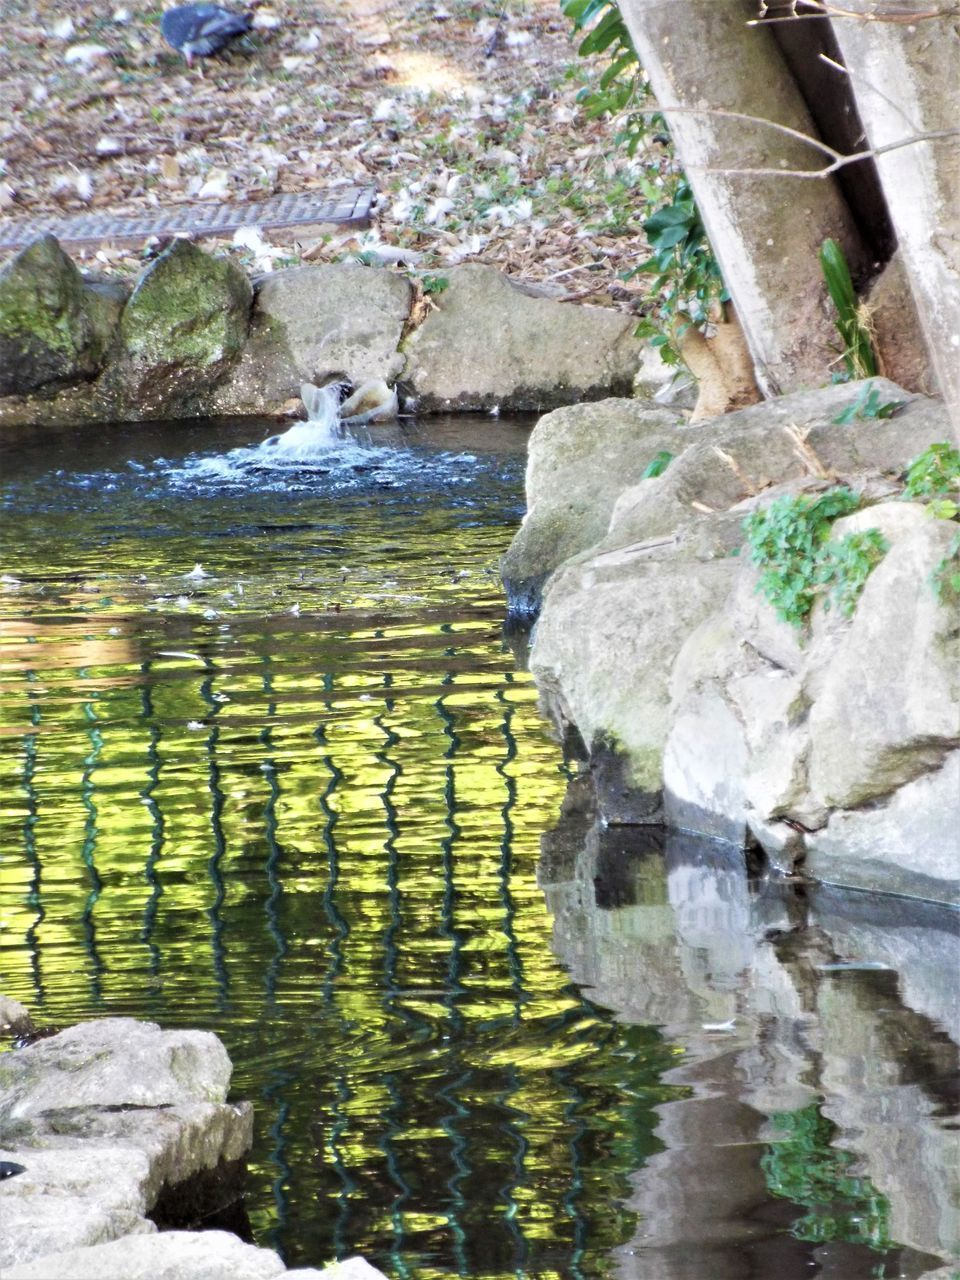 REFLECTION OF ROCKS IN LAKE WATER